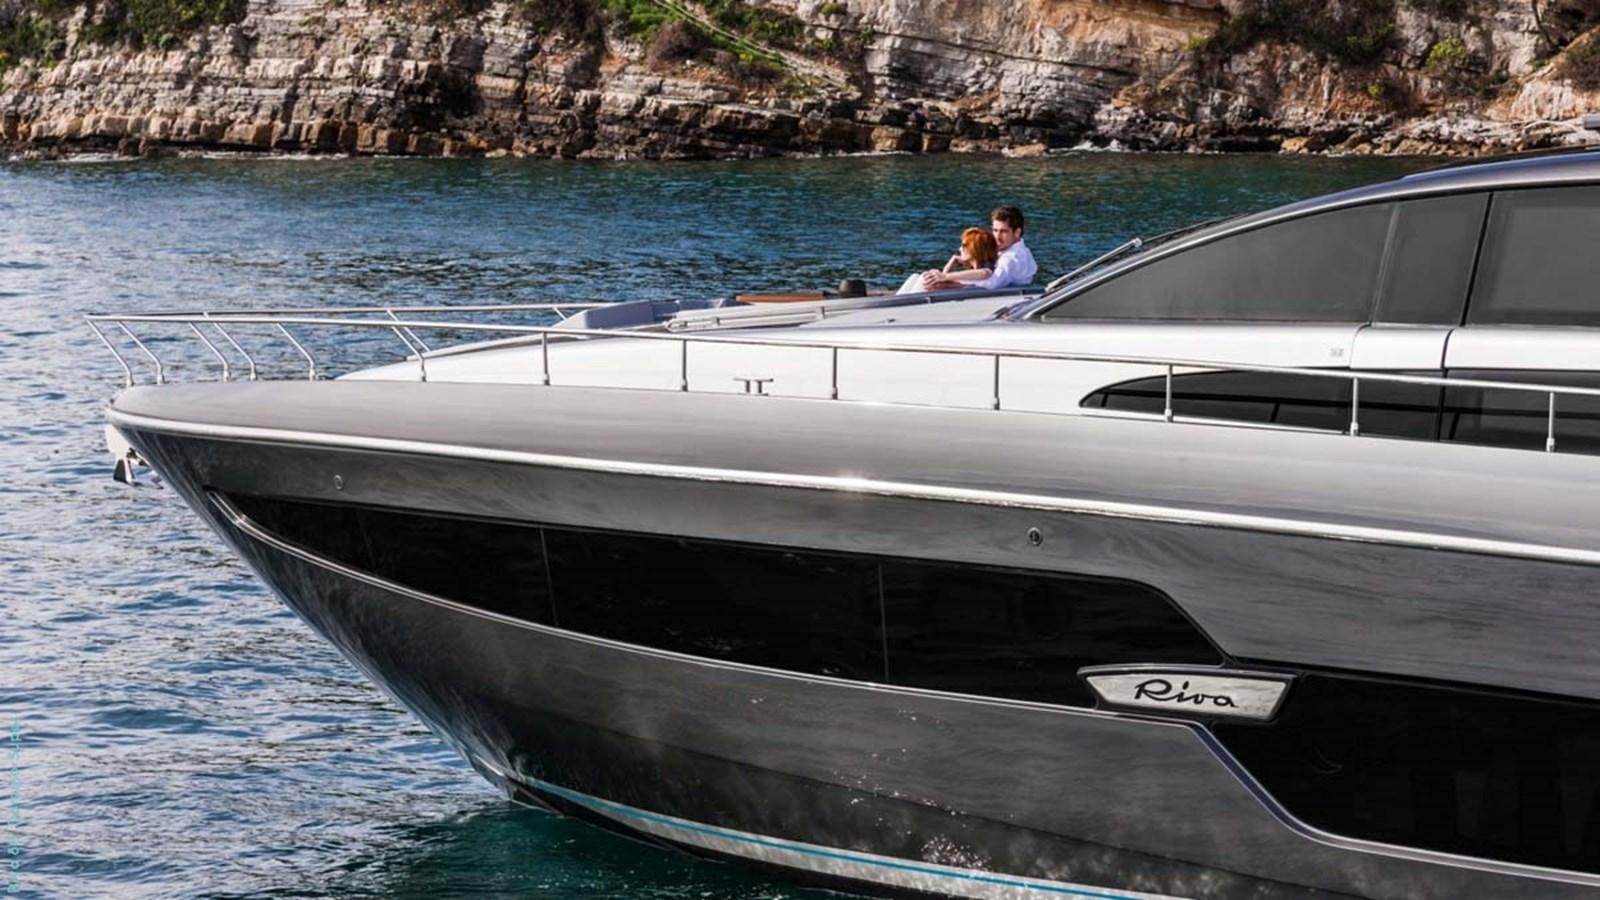 8699-Riva 88 Domino Super 2017 RIVAL YACHTS INC  Motor Yacht 2851204